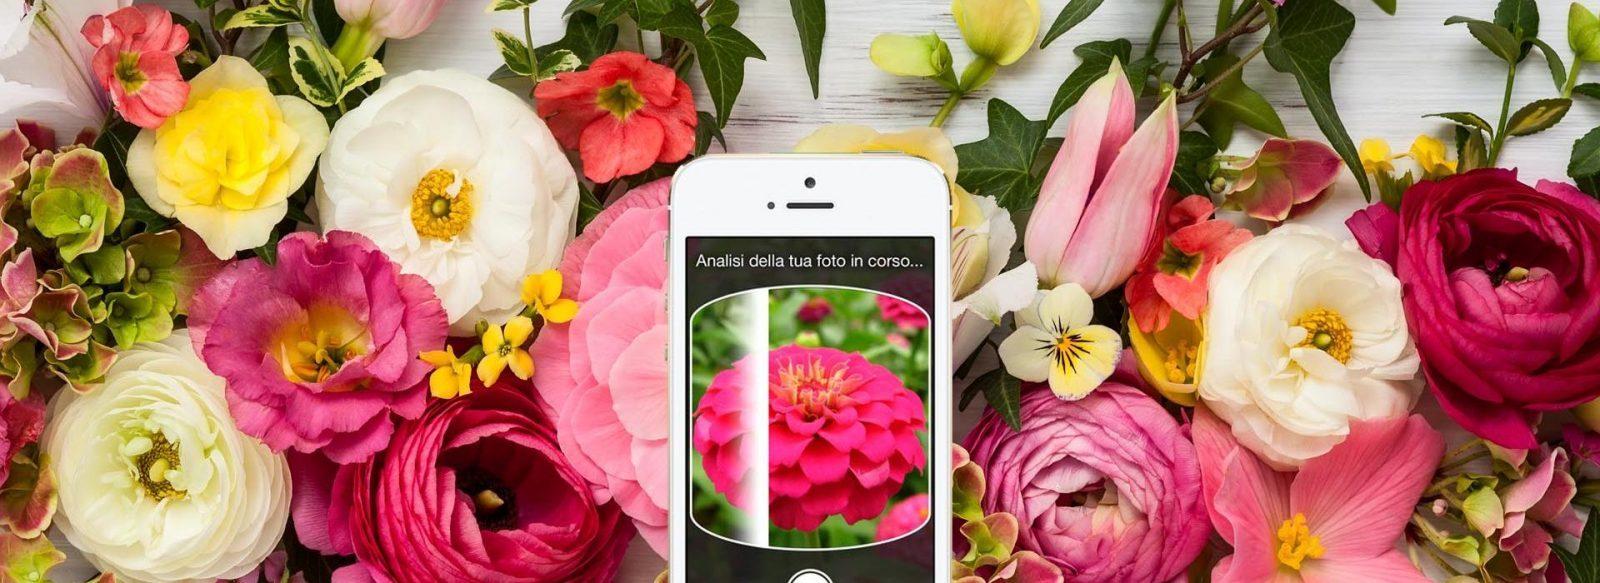 flower design enters the digital age: like that garden - italian